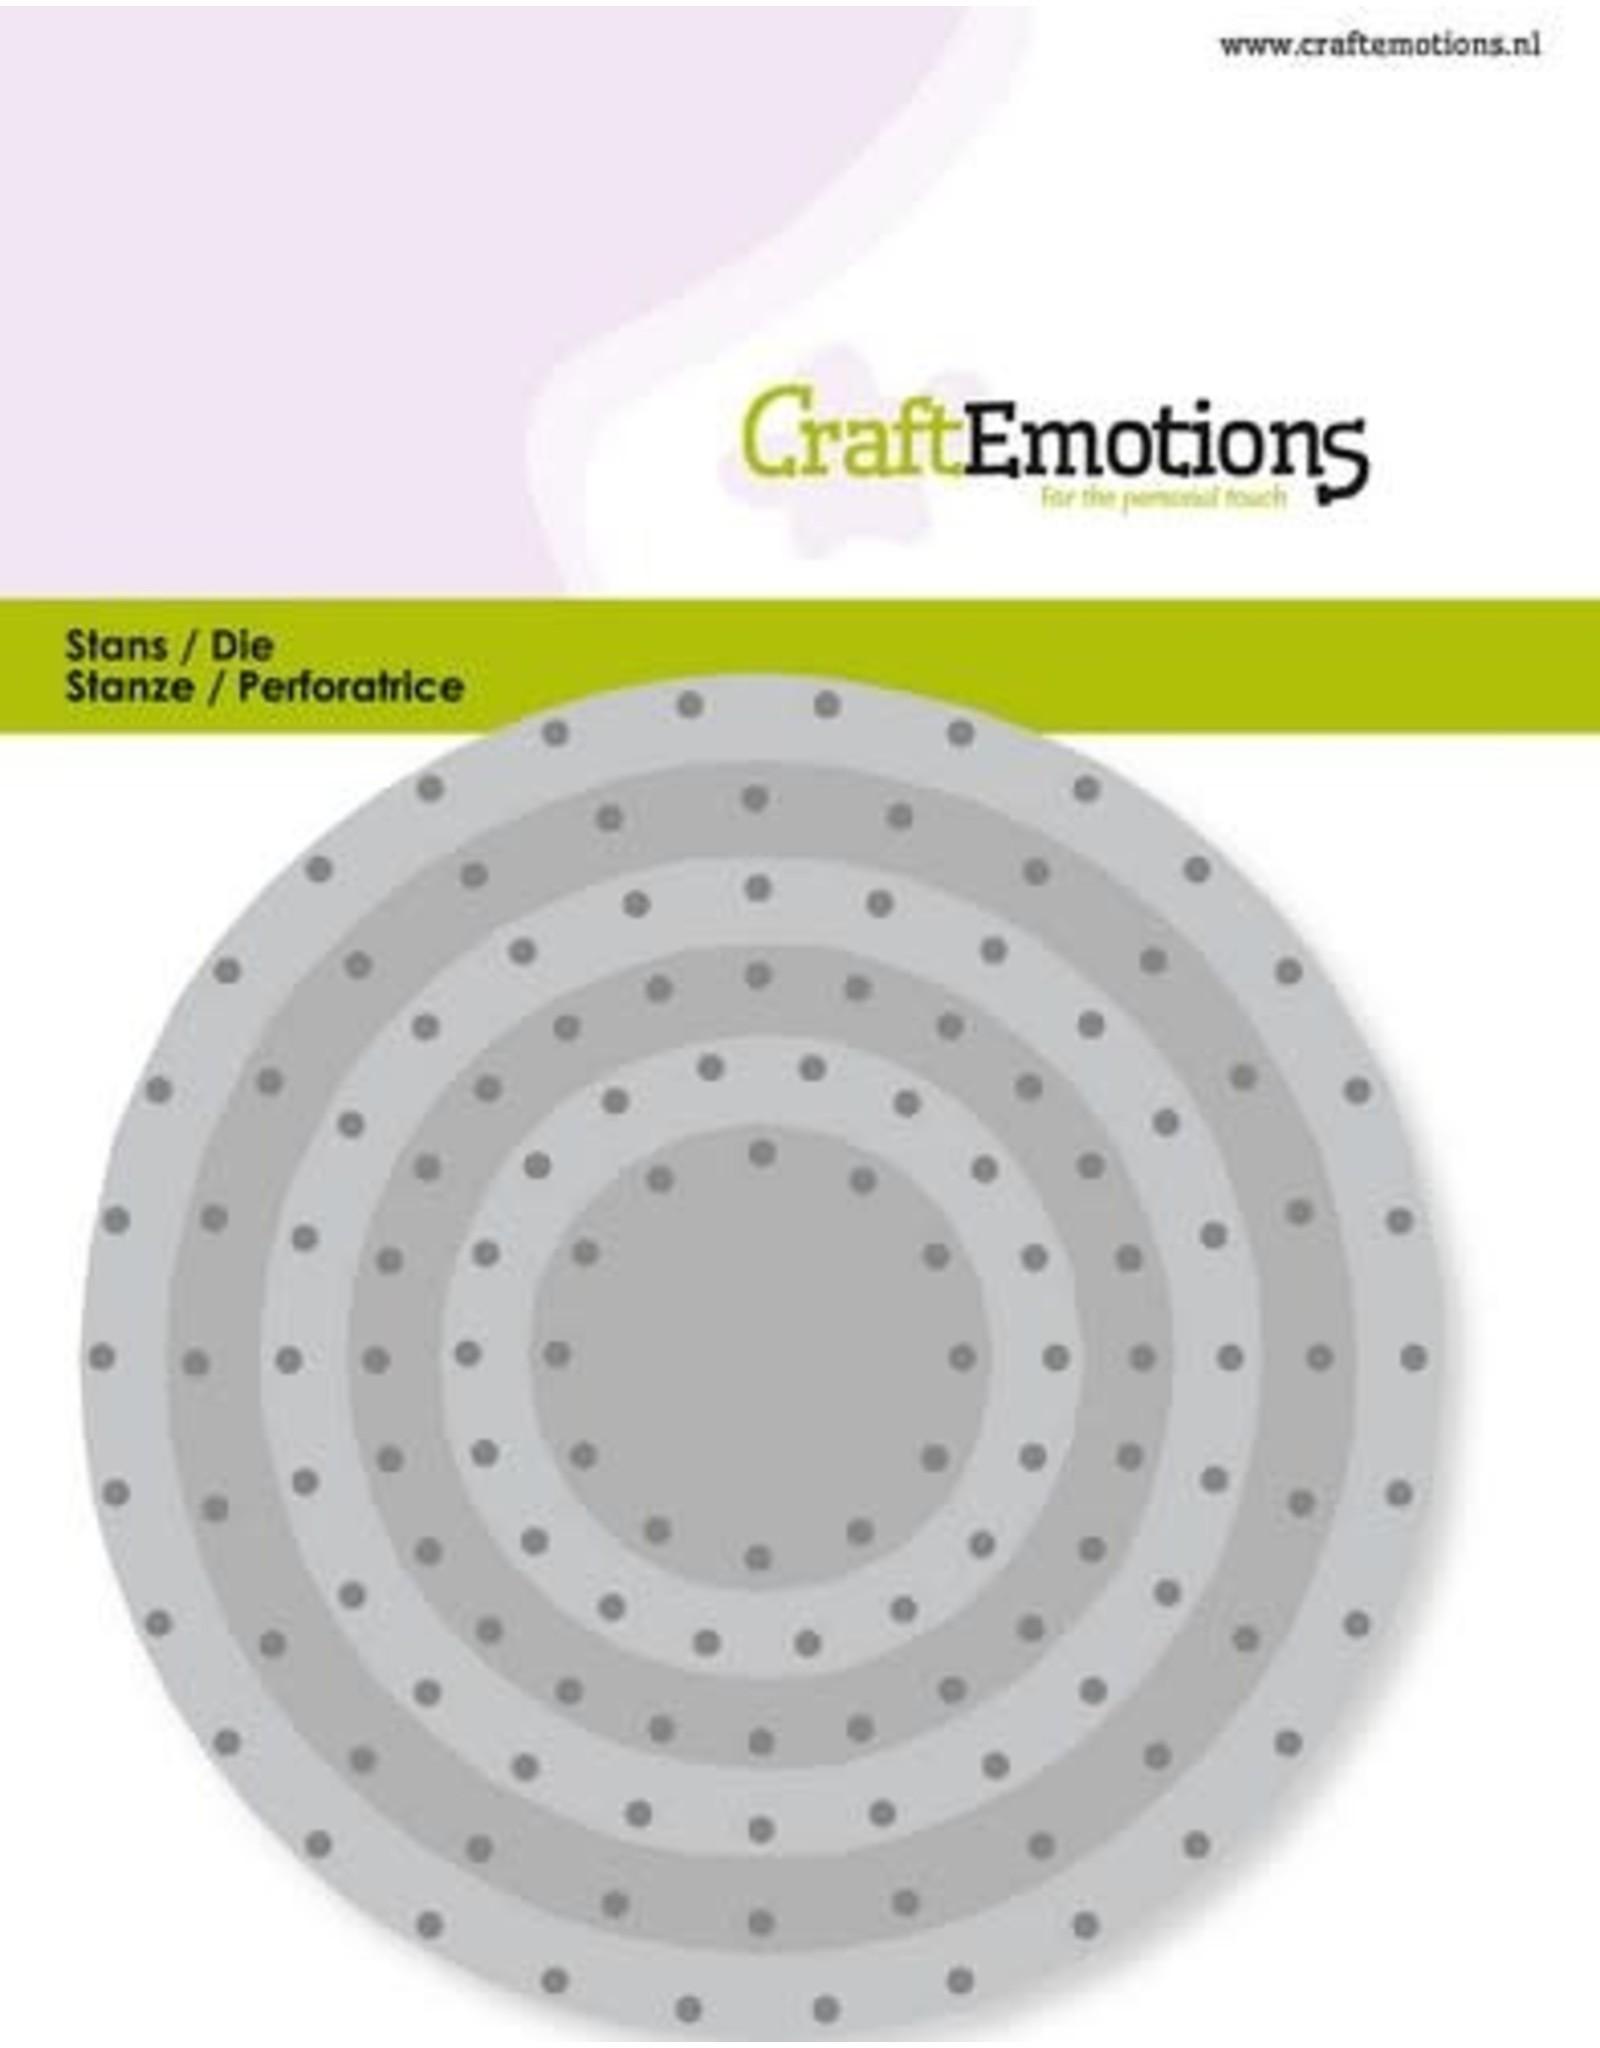 Craft Emotions CraftEmotions Die - cirkels vintage - klinknagels Card 11x9cm - 3,2-9,4cm